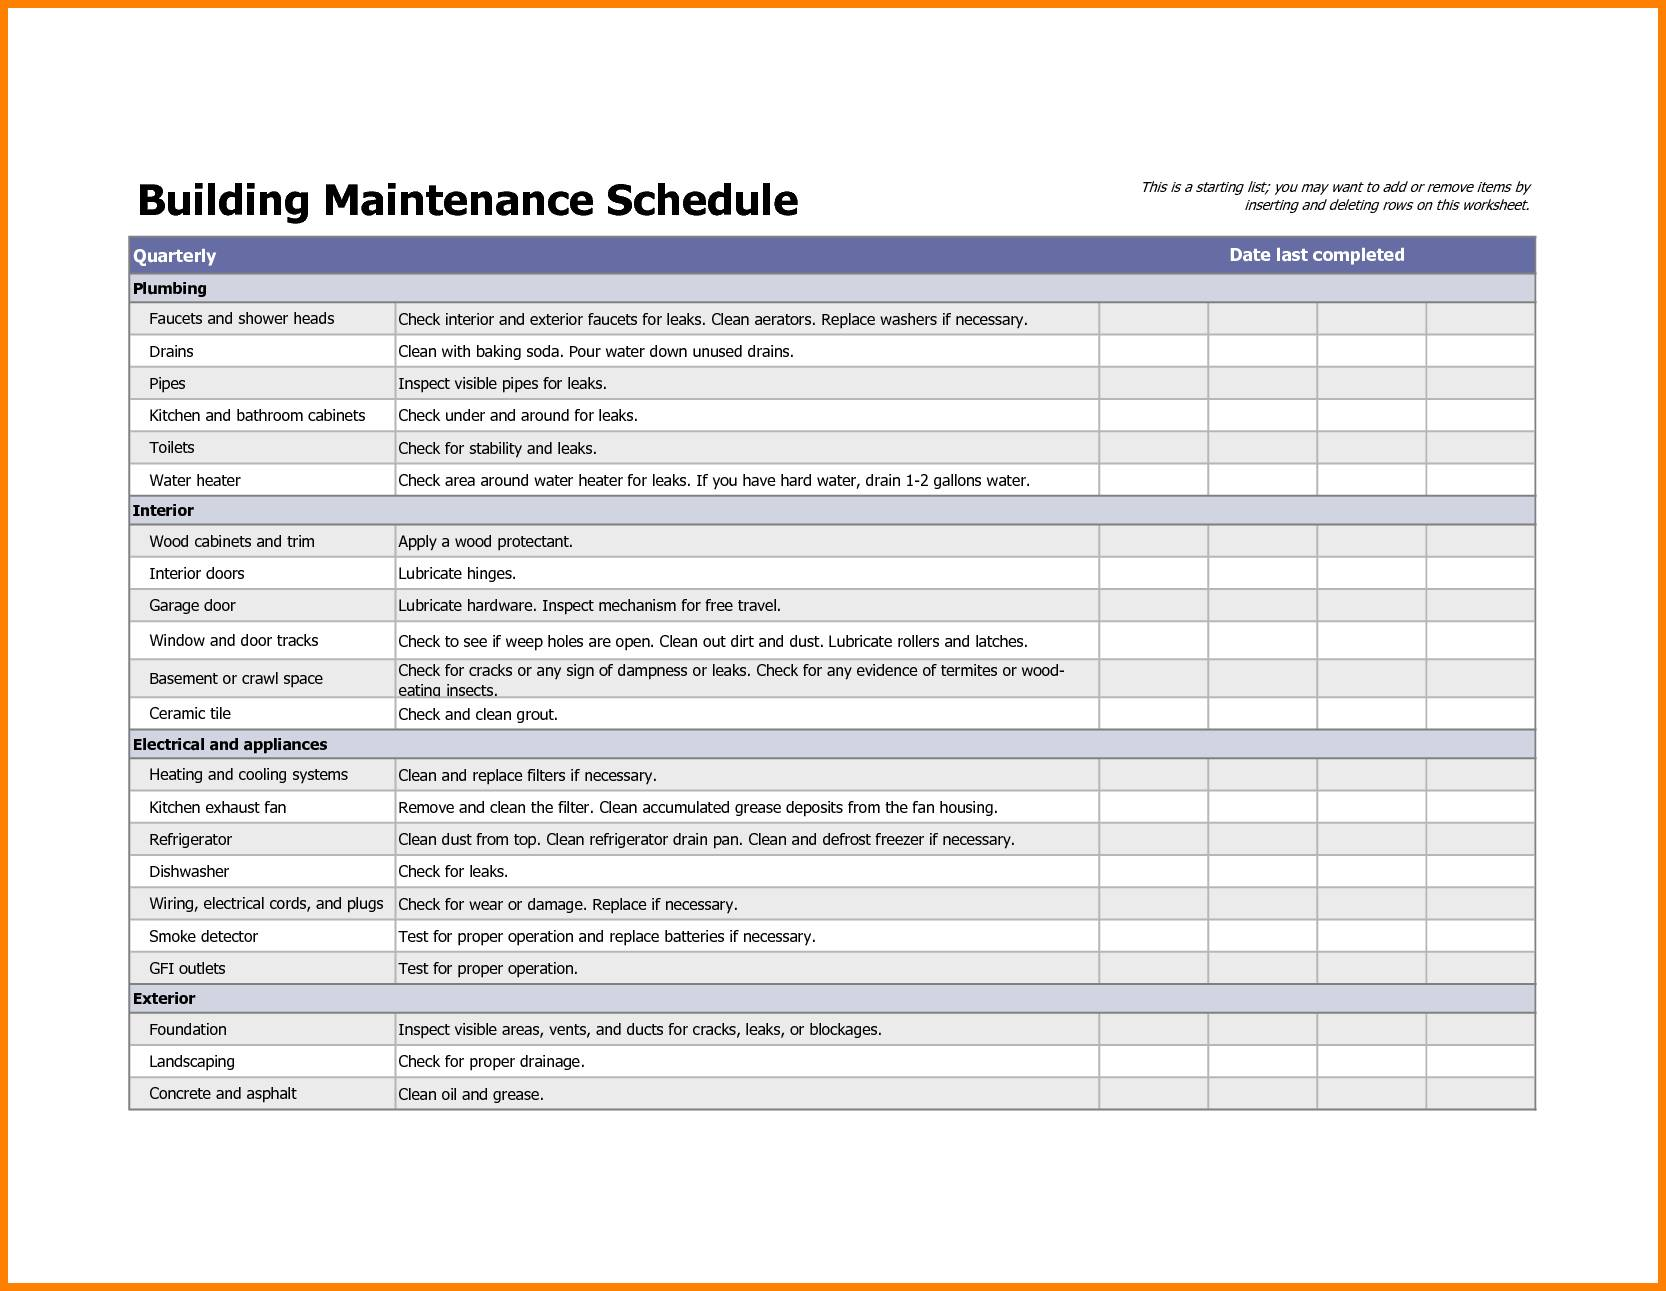 Preventive Maintenance Checklist Templates